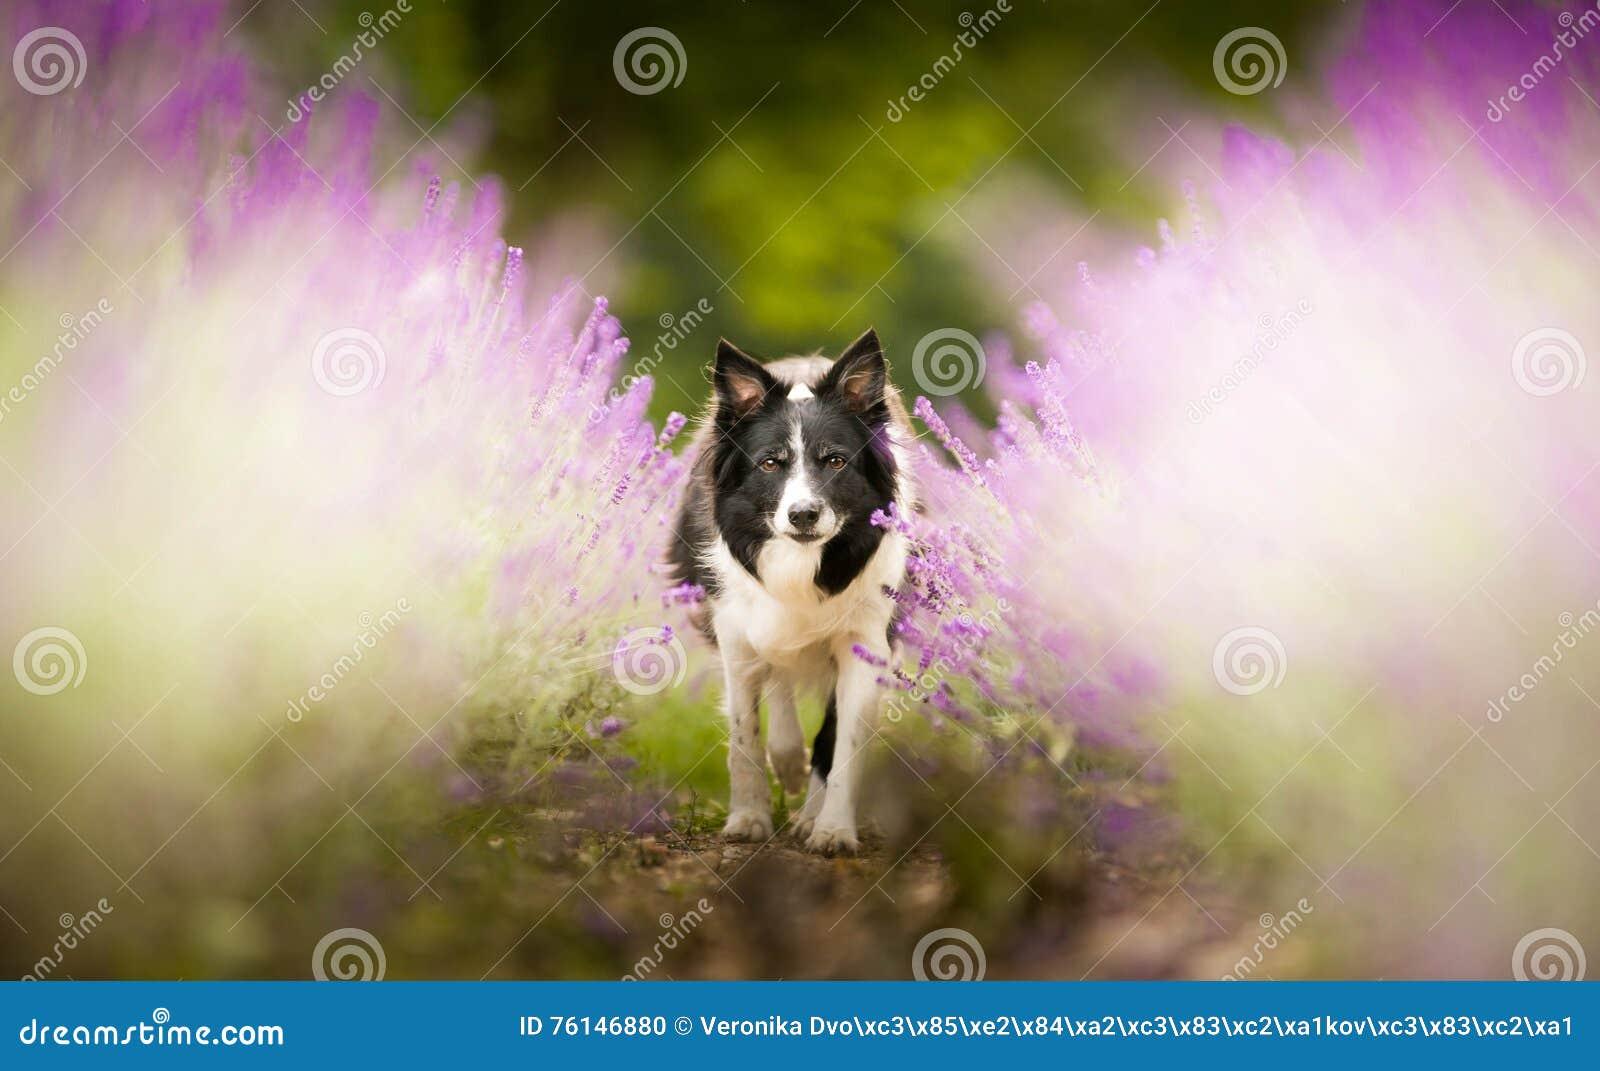 Border Collie in Lavender